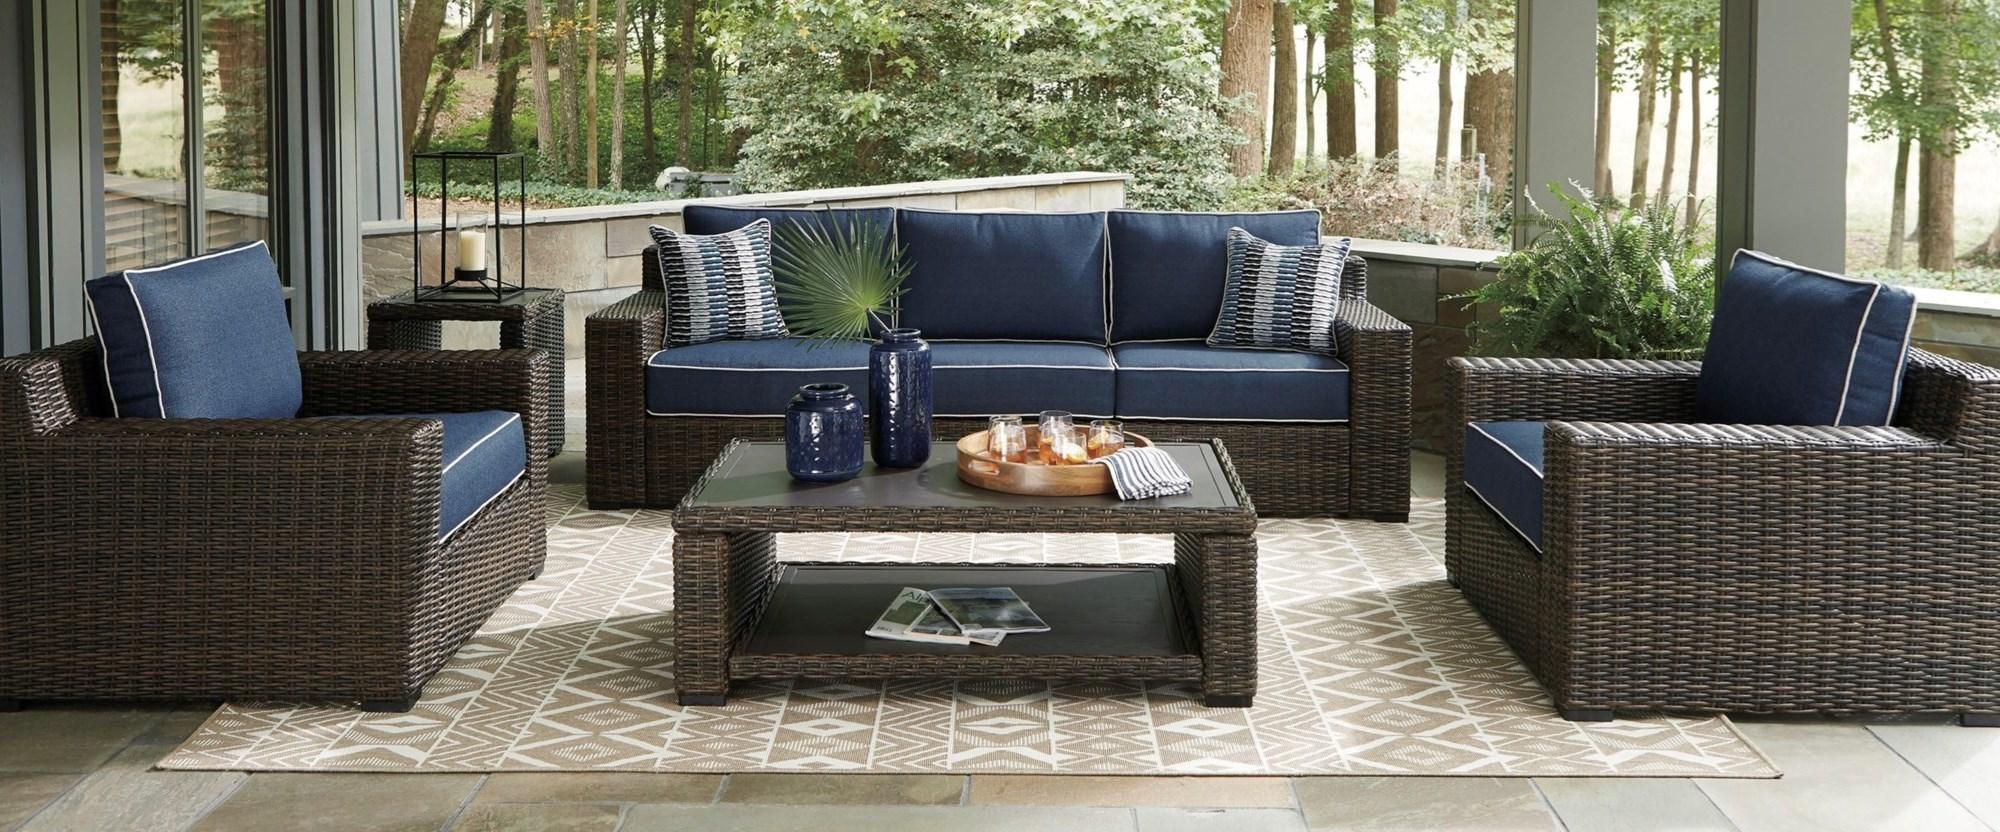 fairfax va outdoor furniture store